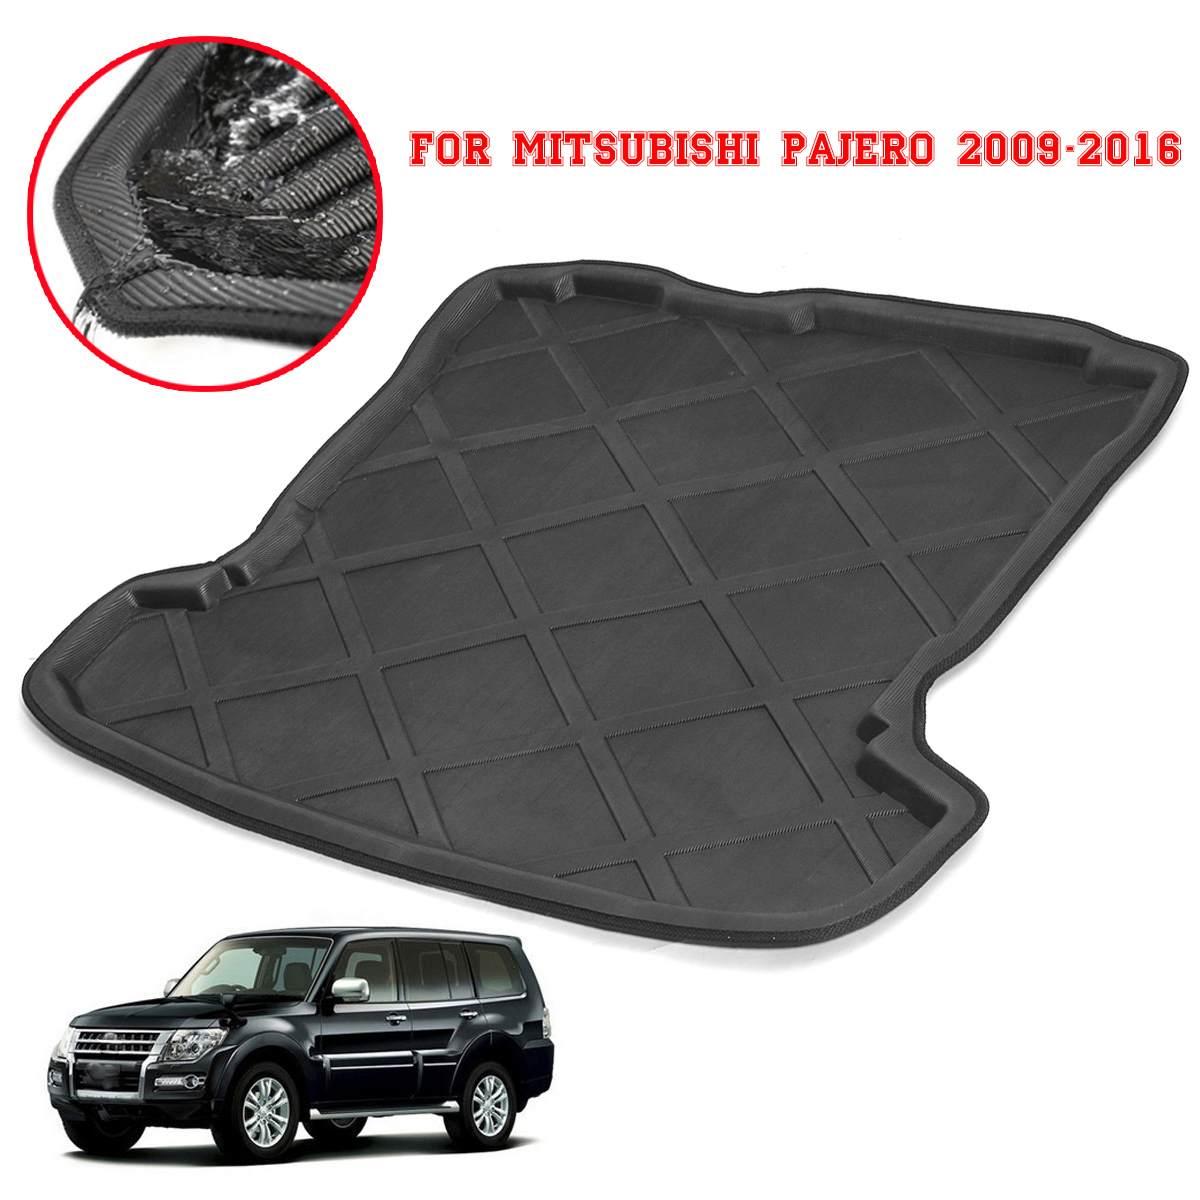 For Mitsubishi Pajero 2009-2016 Car Rear Boot Liner Trunk Cargo Mat Tray  Floor Carpet Mud Pad